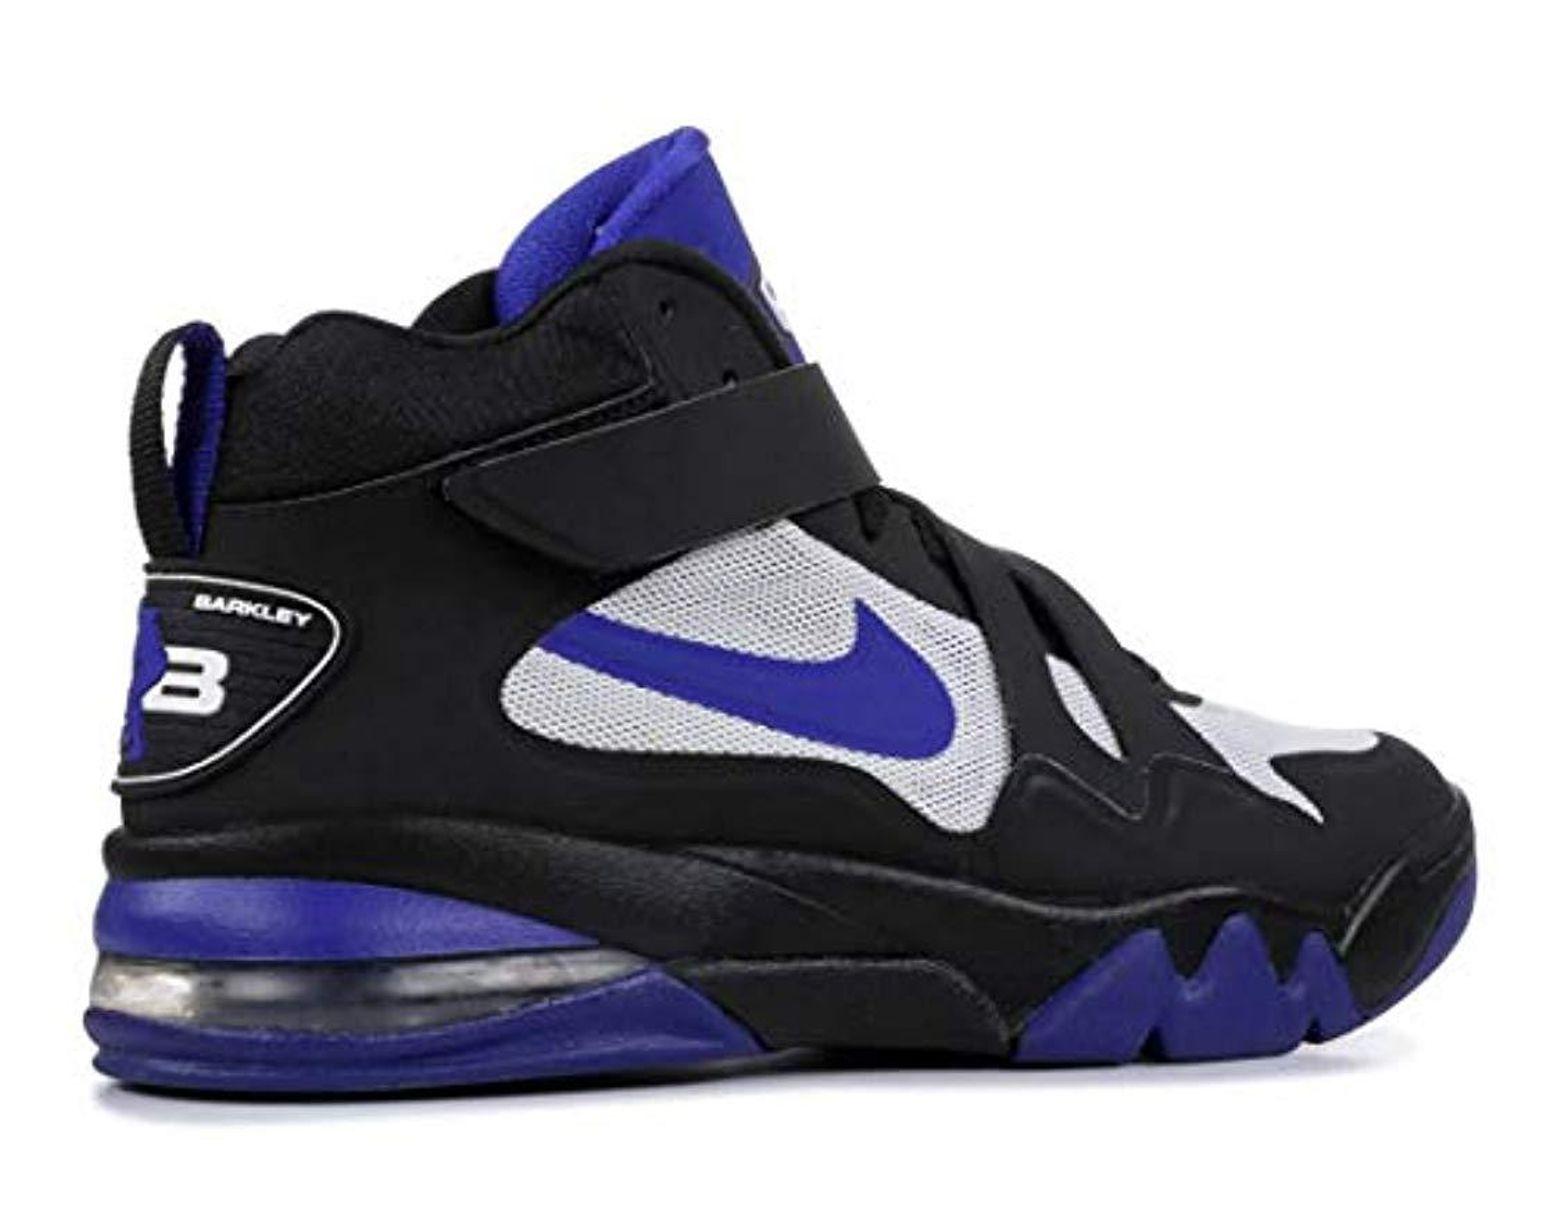 For 555105 Air 400 Force Nike Blue Men 2013 Lyst Max In R5Aq3j4L